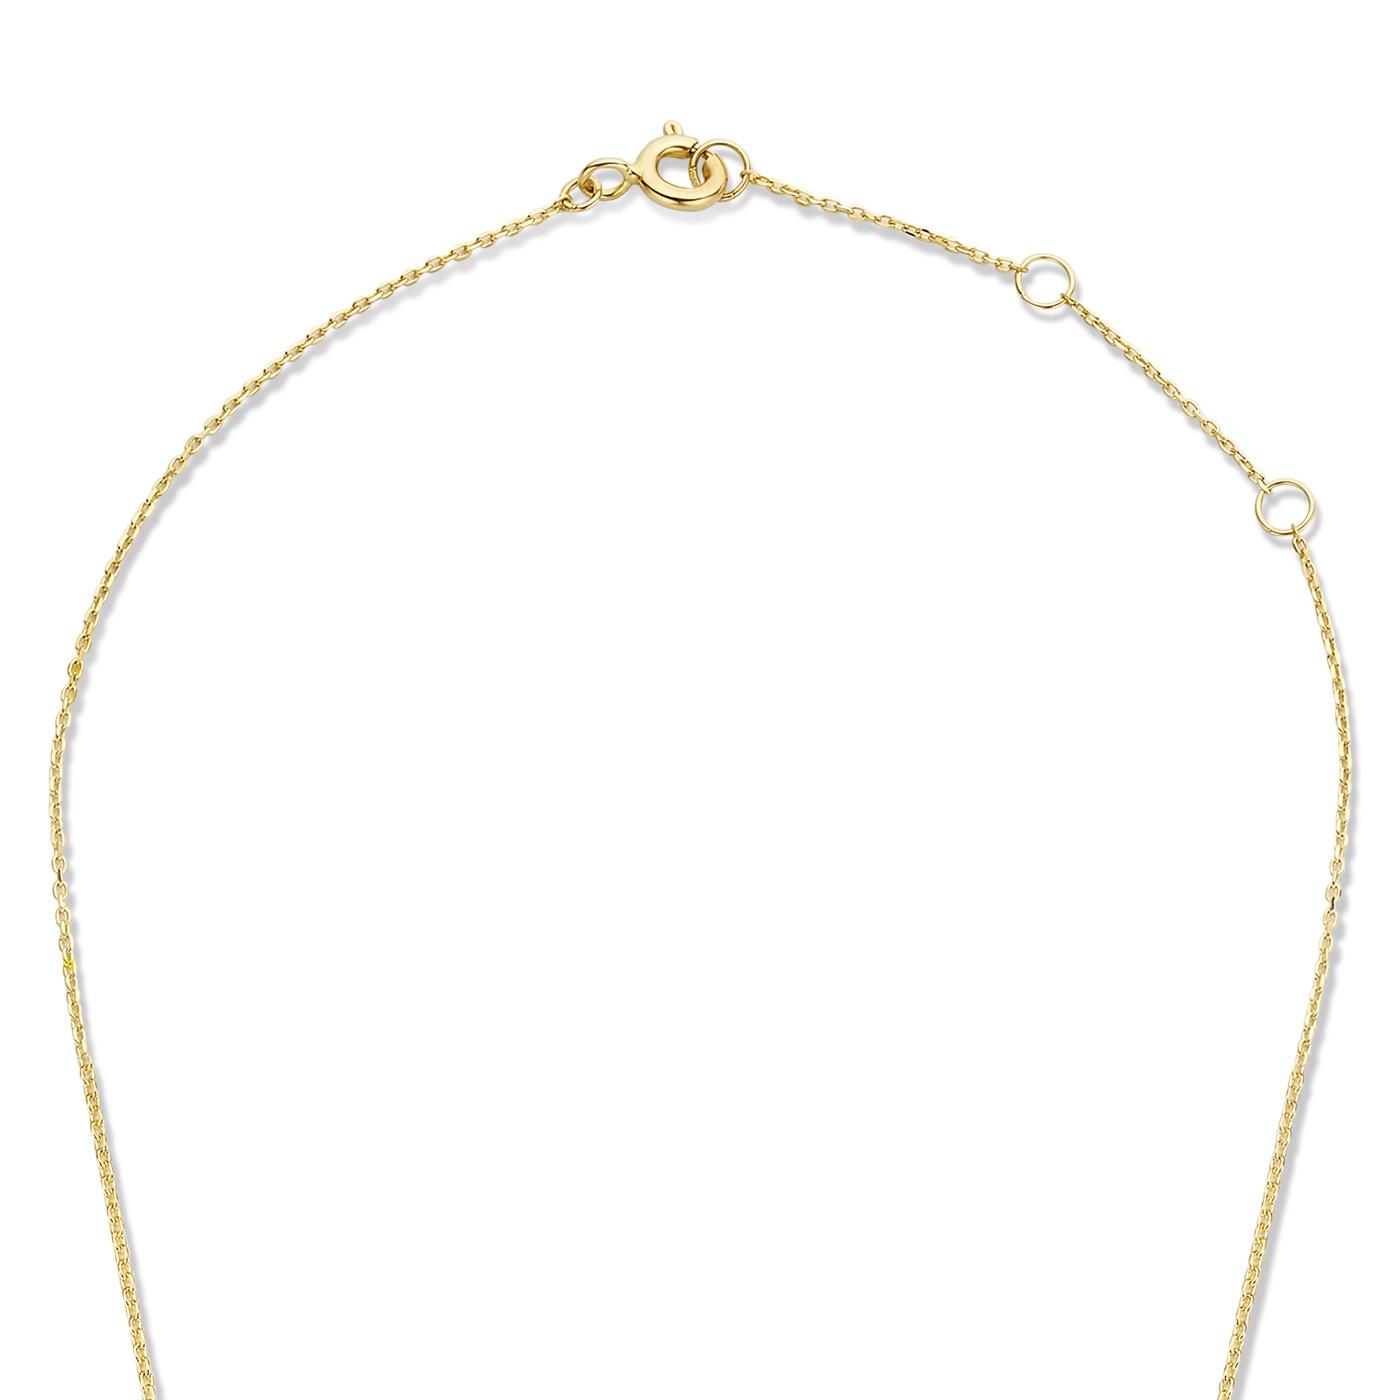 Isabel Bernard Le Marais Garance 585er Goldkette mit Zirkonia